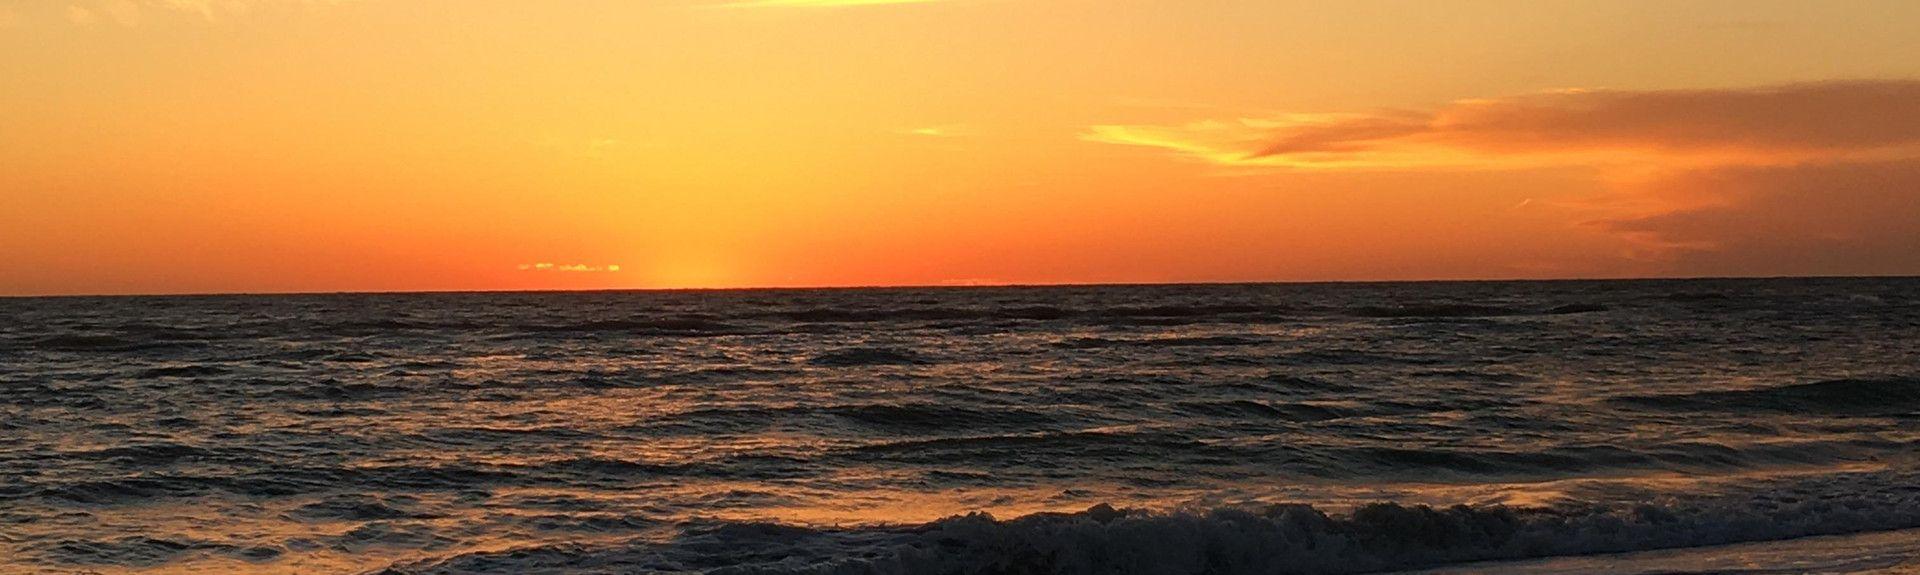 Manasota Beach, Englewood, Florida, Estados Unidos